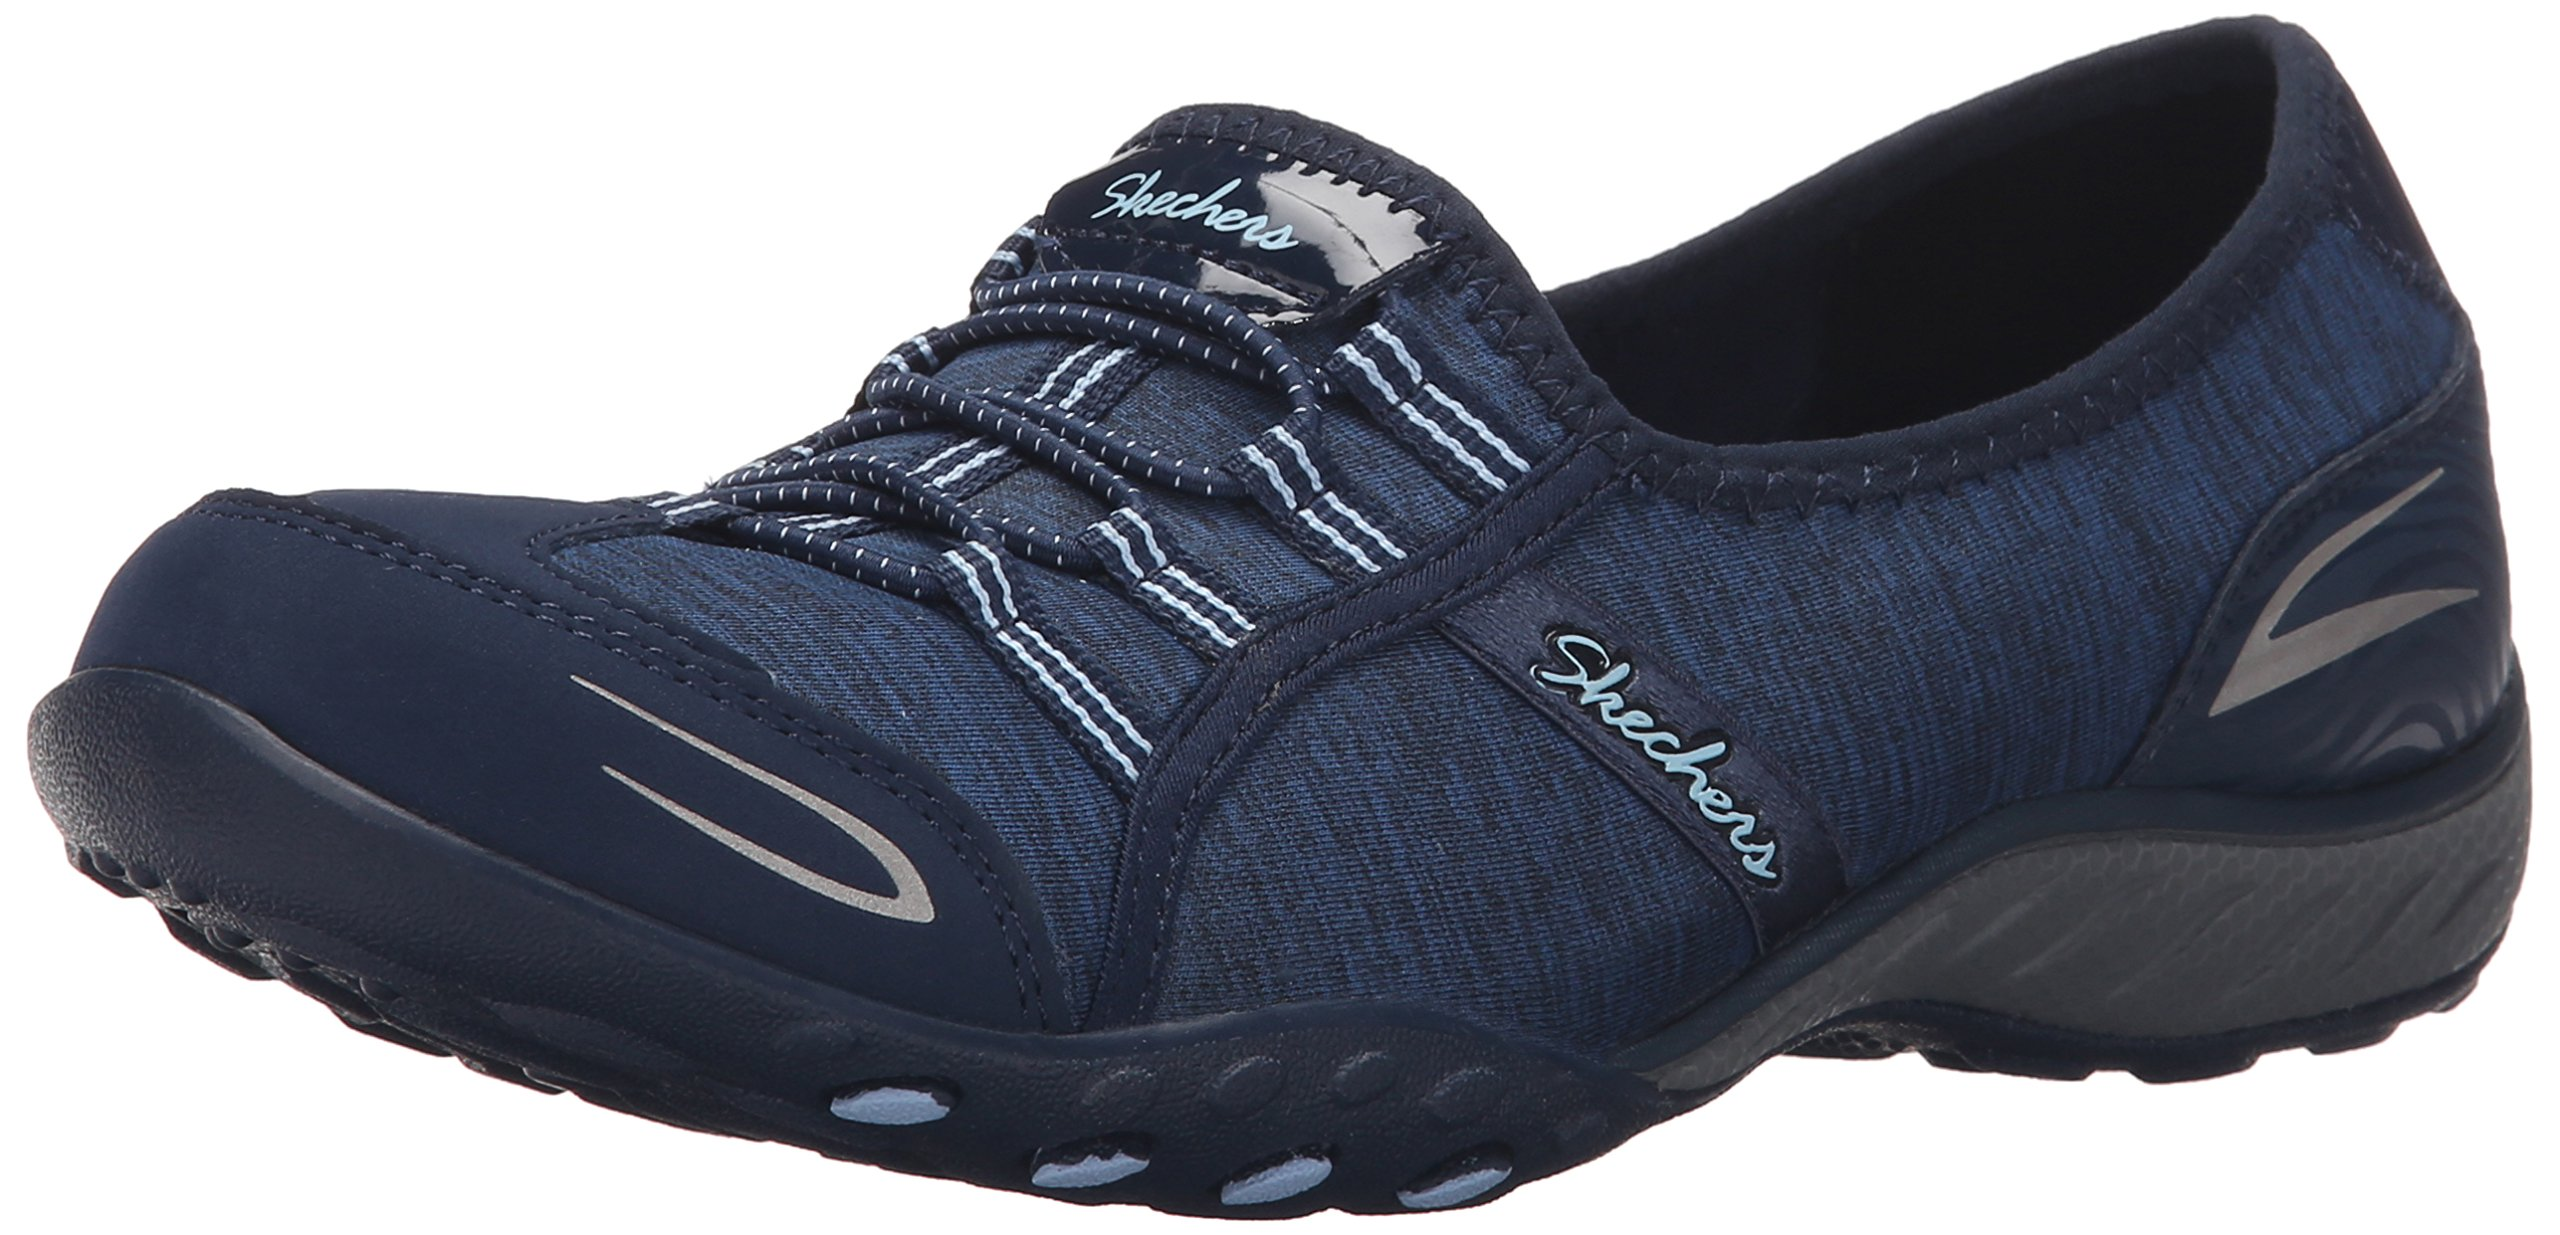 Skechers Sport Women's Breathe Easy Good Life Walking Shoe, Navy/Light Blue, 8 M US